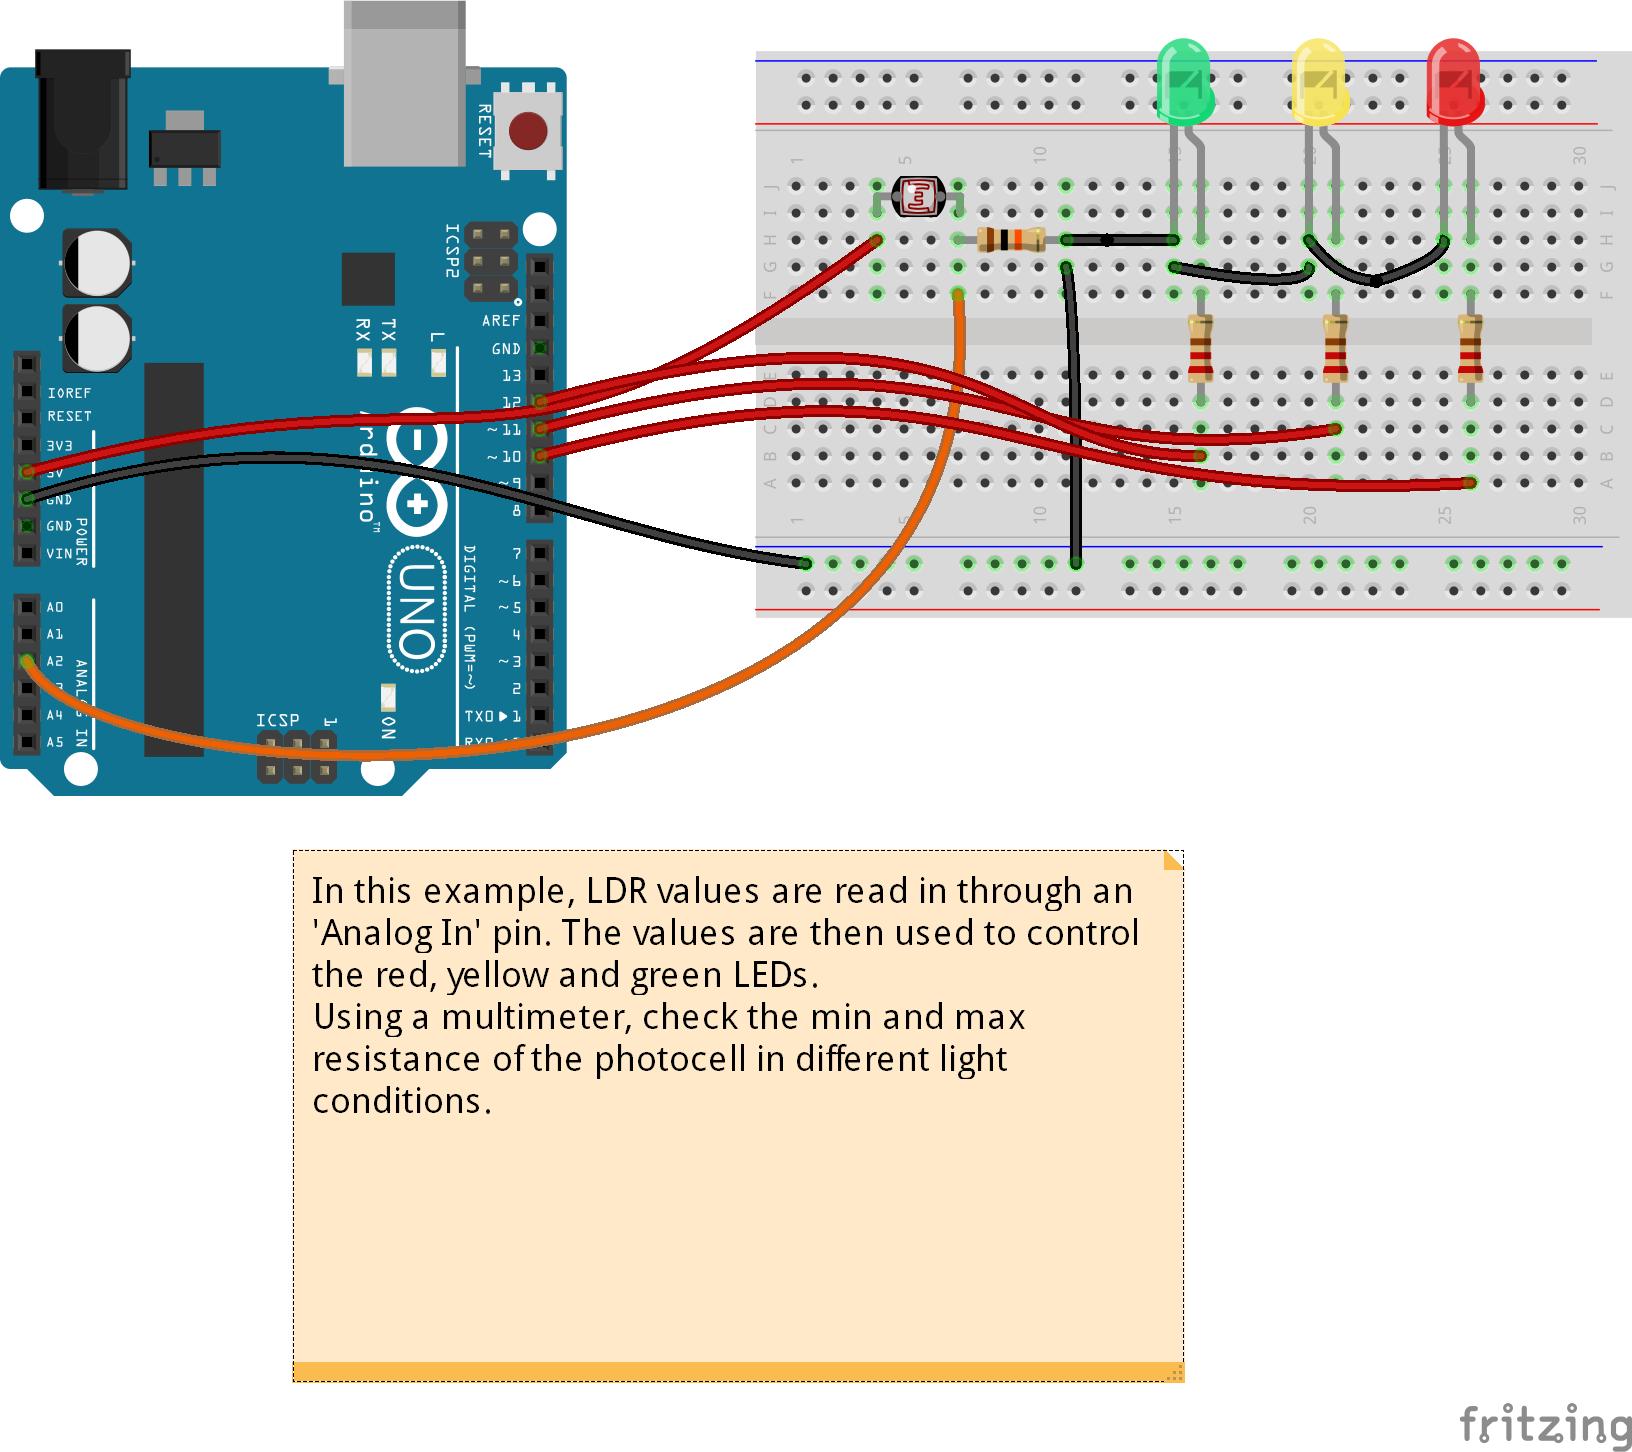 Arduino Sensor Cahaya Ldr Atau Apabila Gelap Led Merah On Dan Terang Kuning Akan Menyala Untuk Menunjukkan Bahwa Litar Berfungsi Dengan Baik Hijau